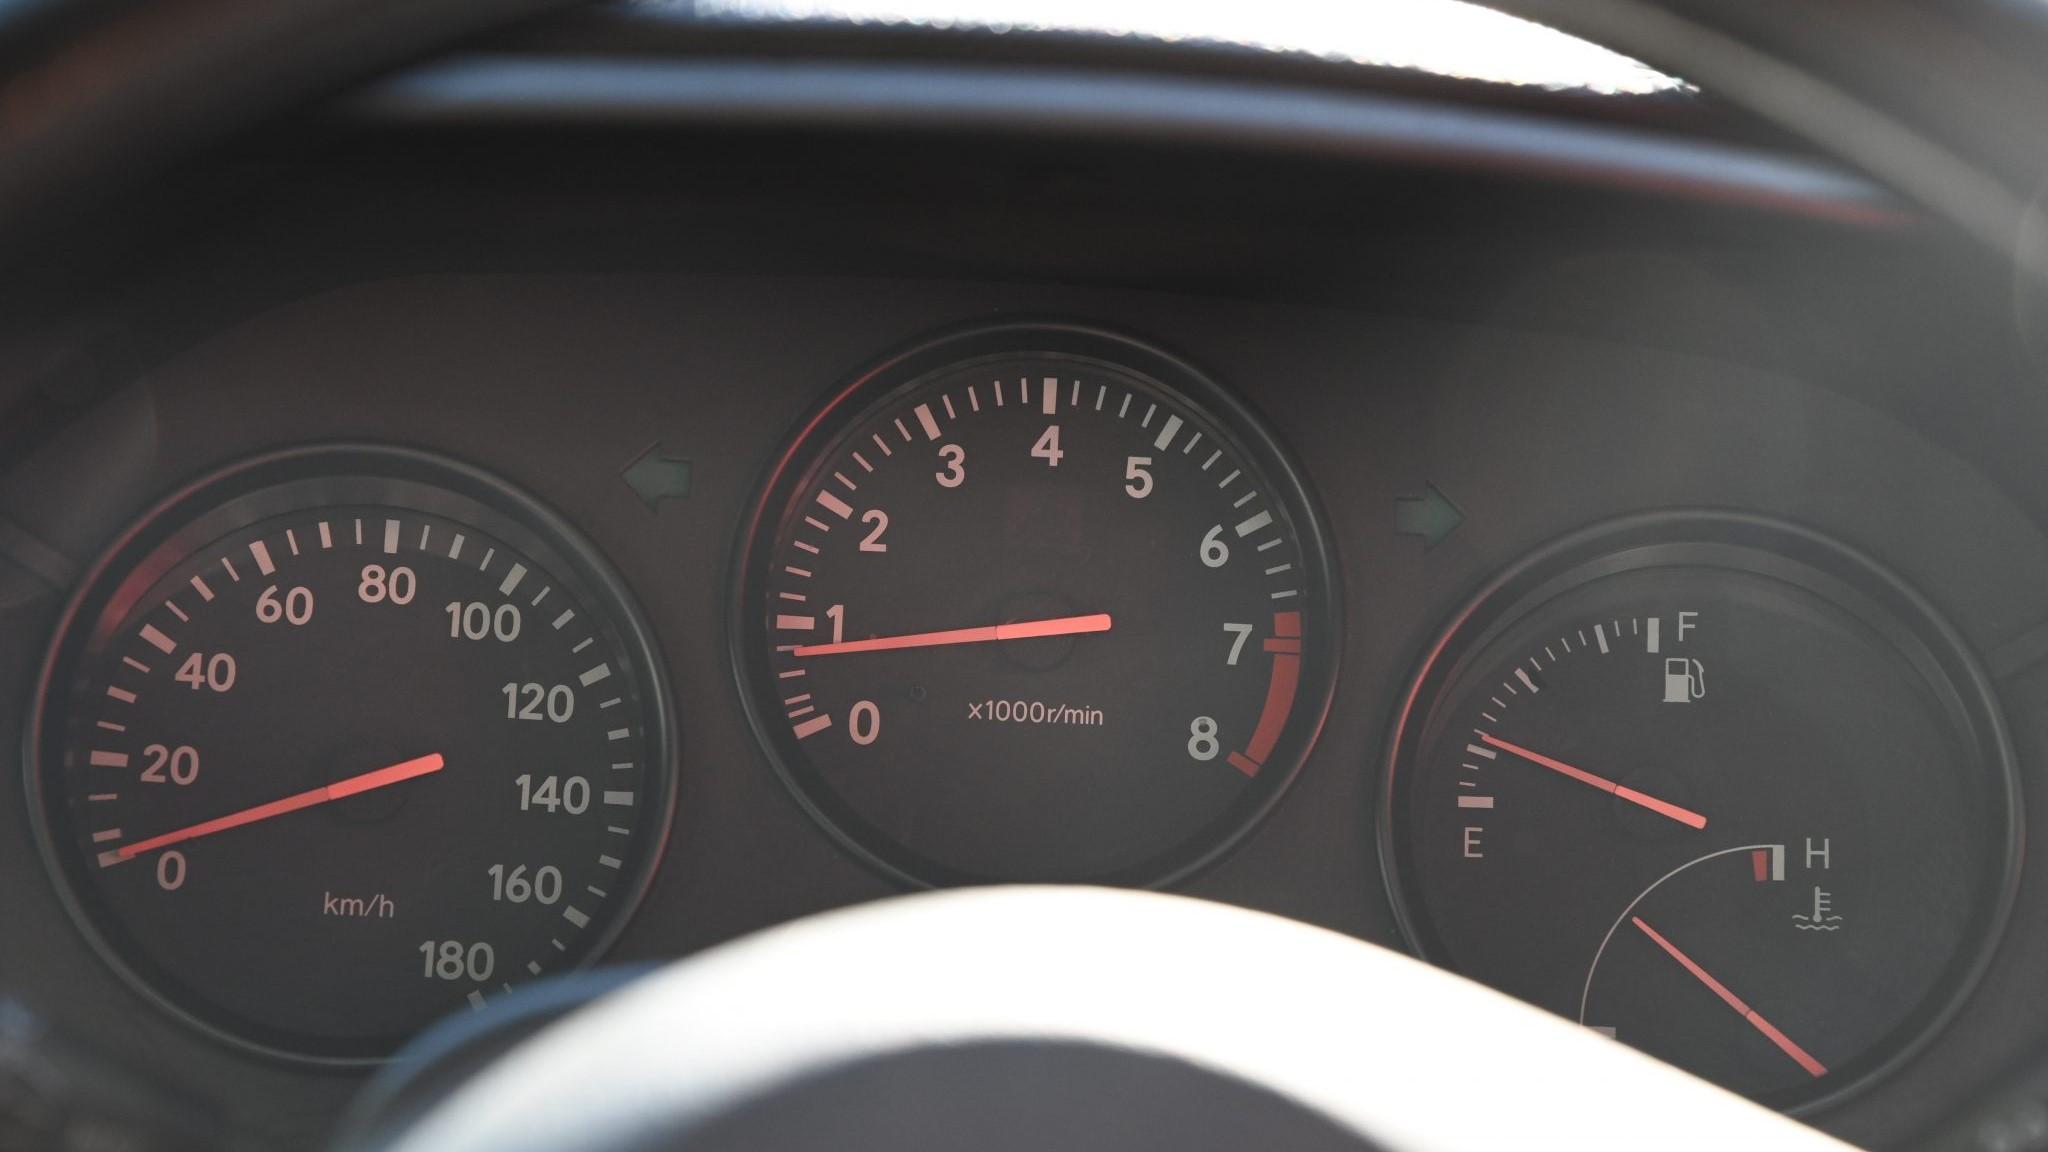 The Toyota RZ Odometer